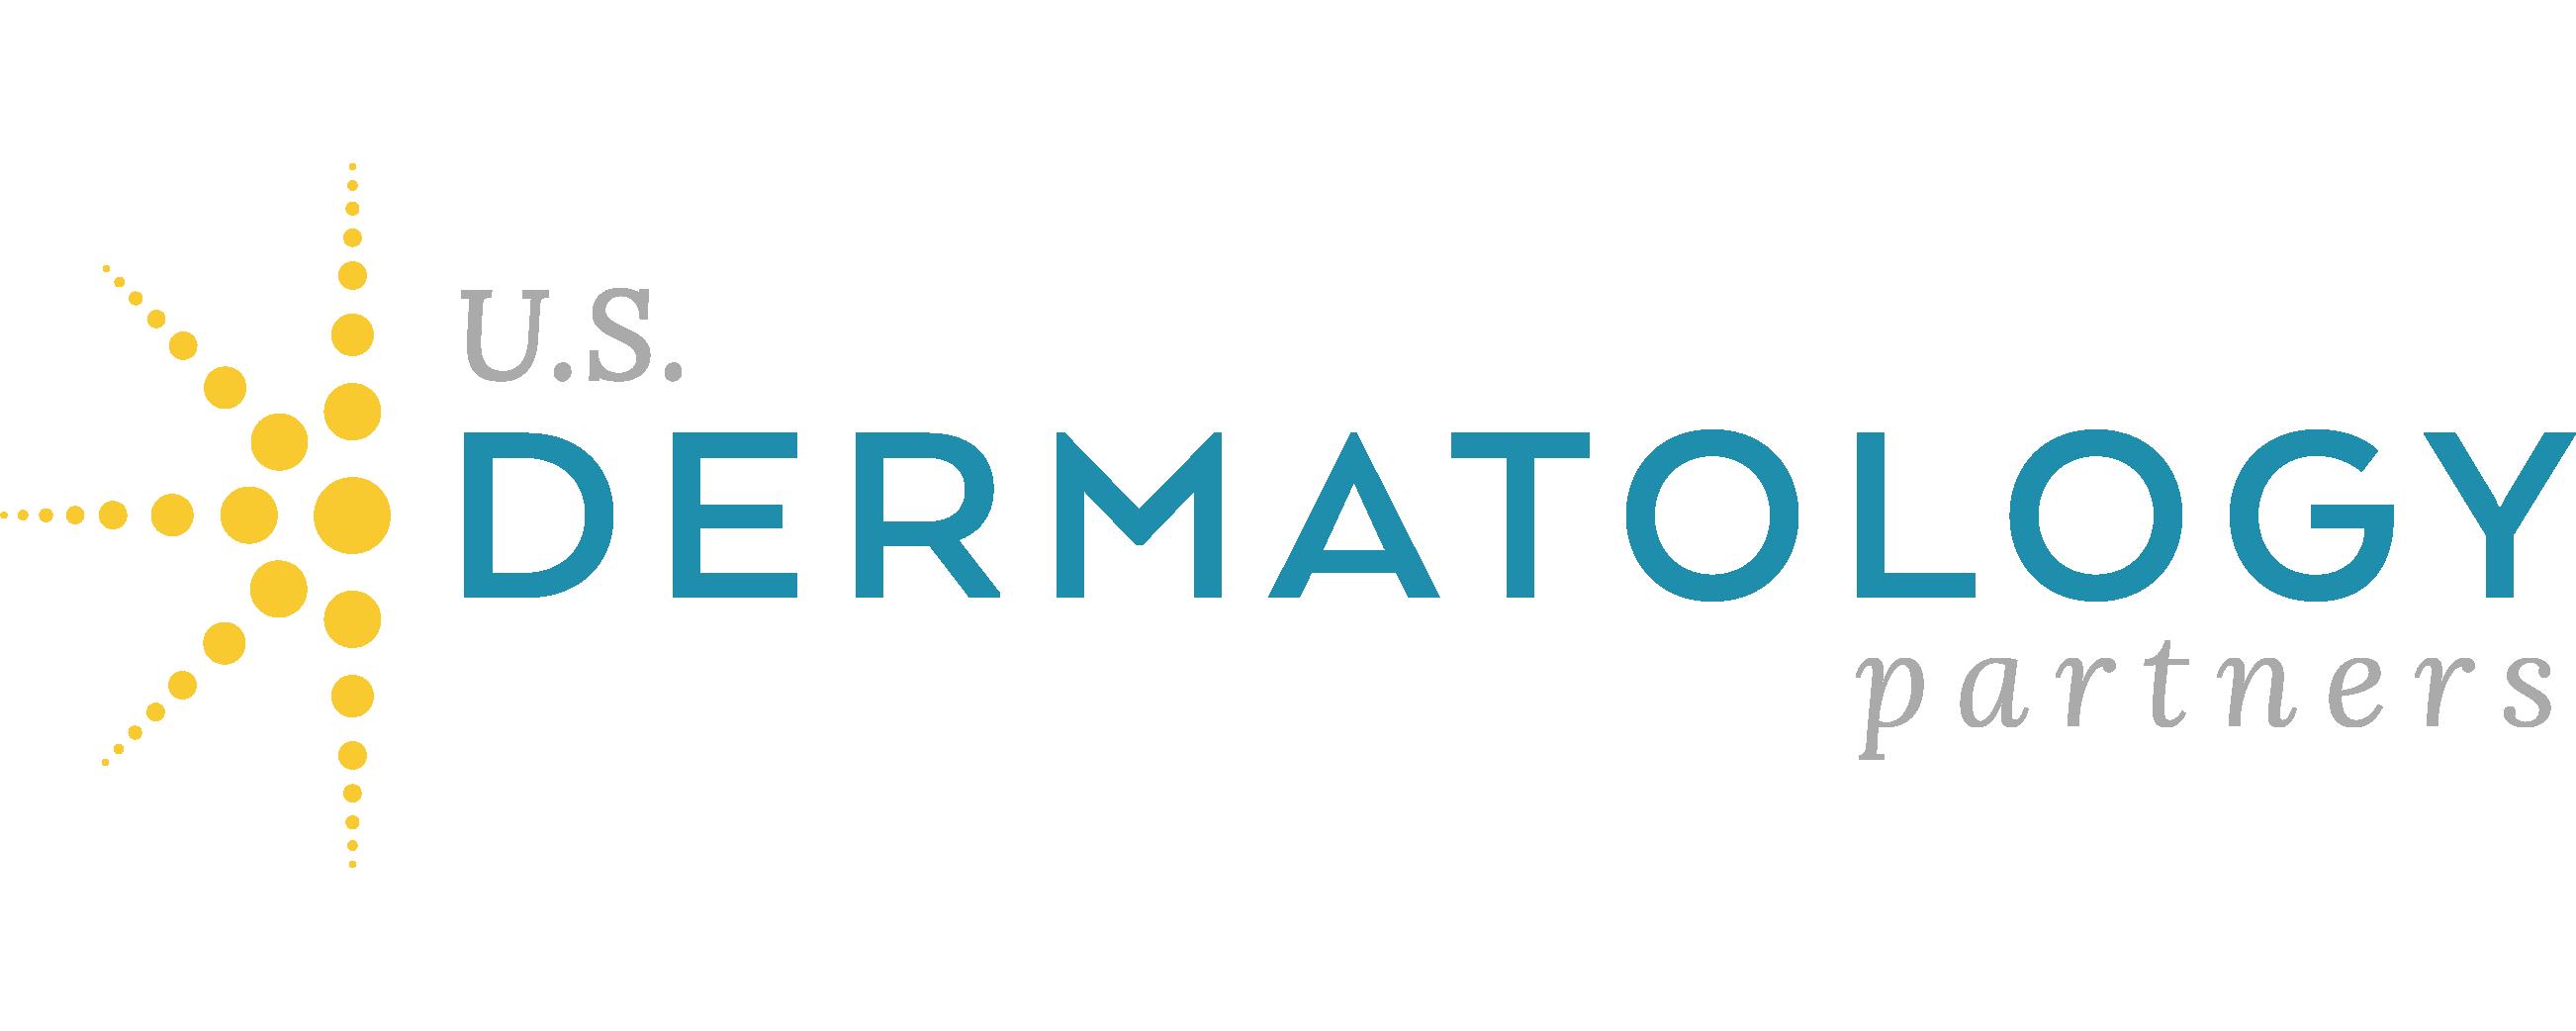 U.S. Dermatology Partners  - Fort Worth Cultural District Logo